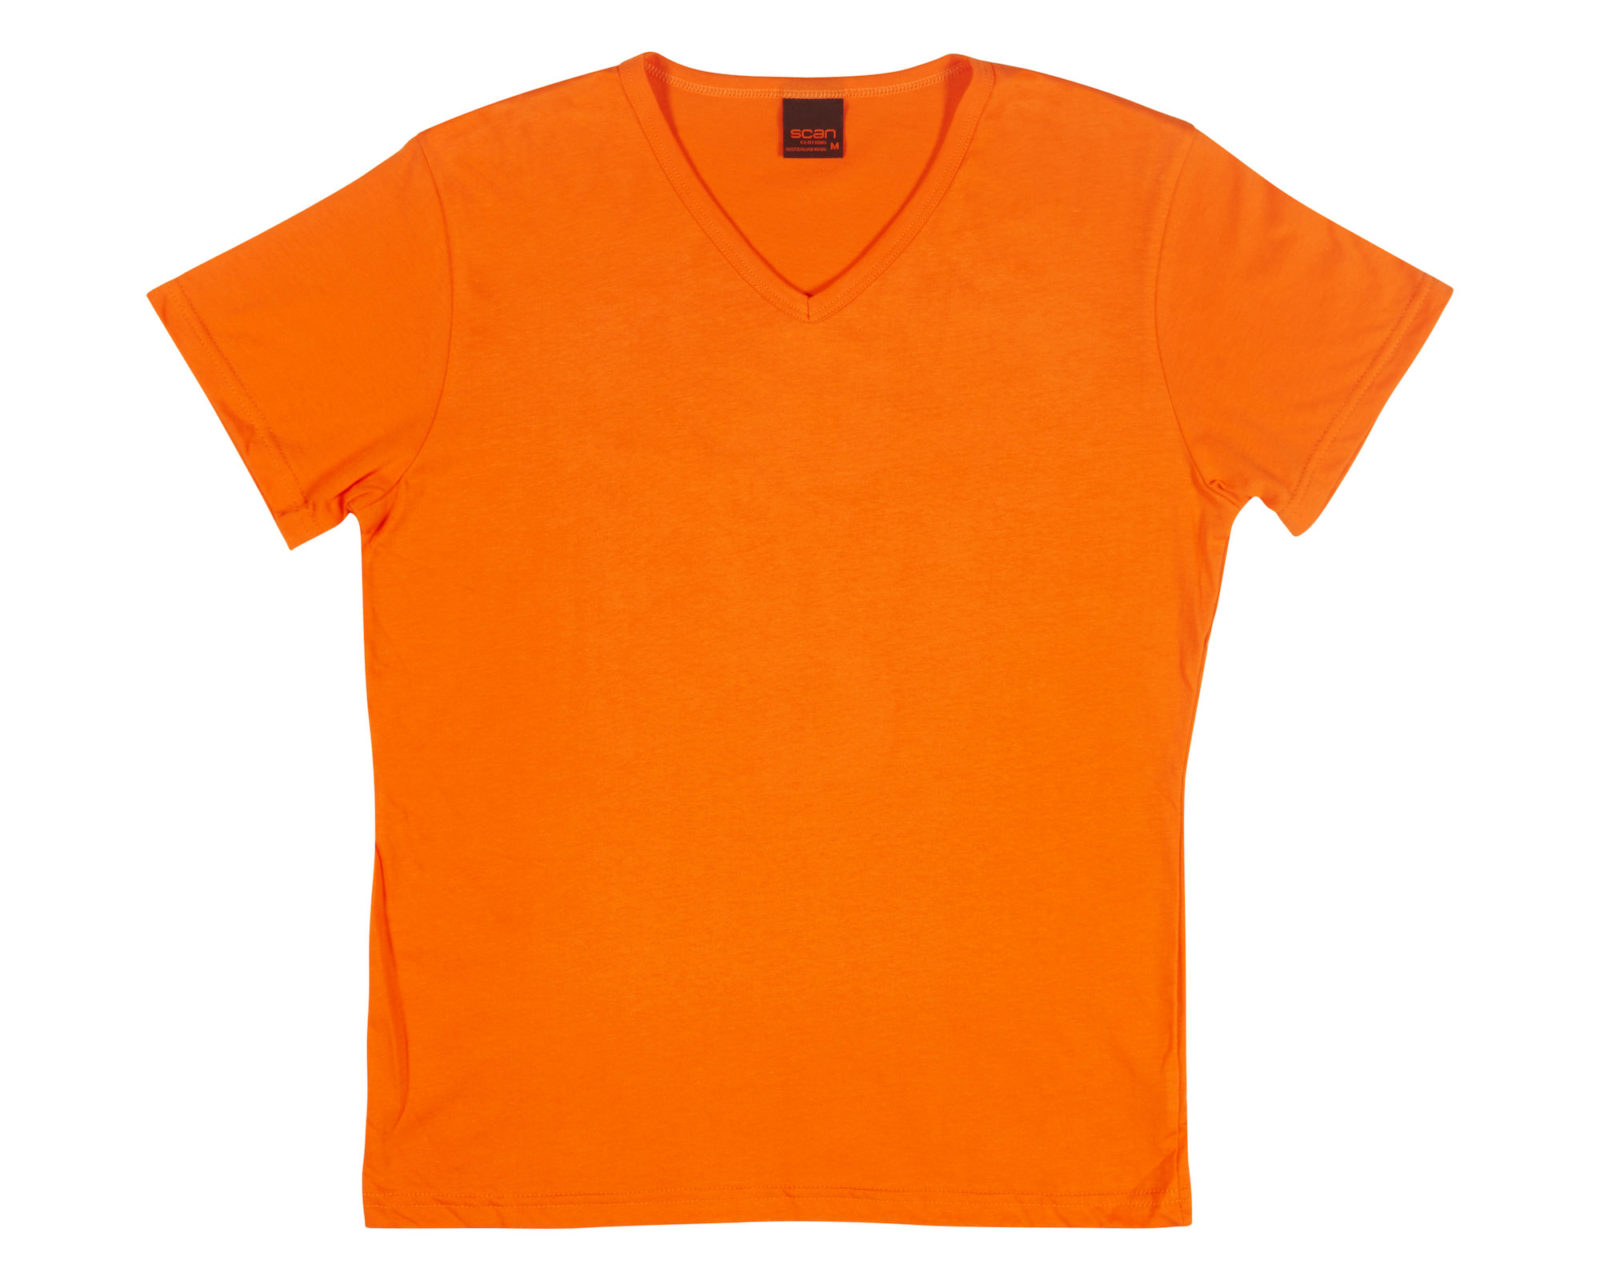 Custom made men 39 s clothing t shirts polo shirts for Custom t shirts under 10